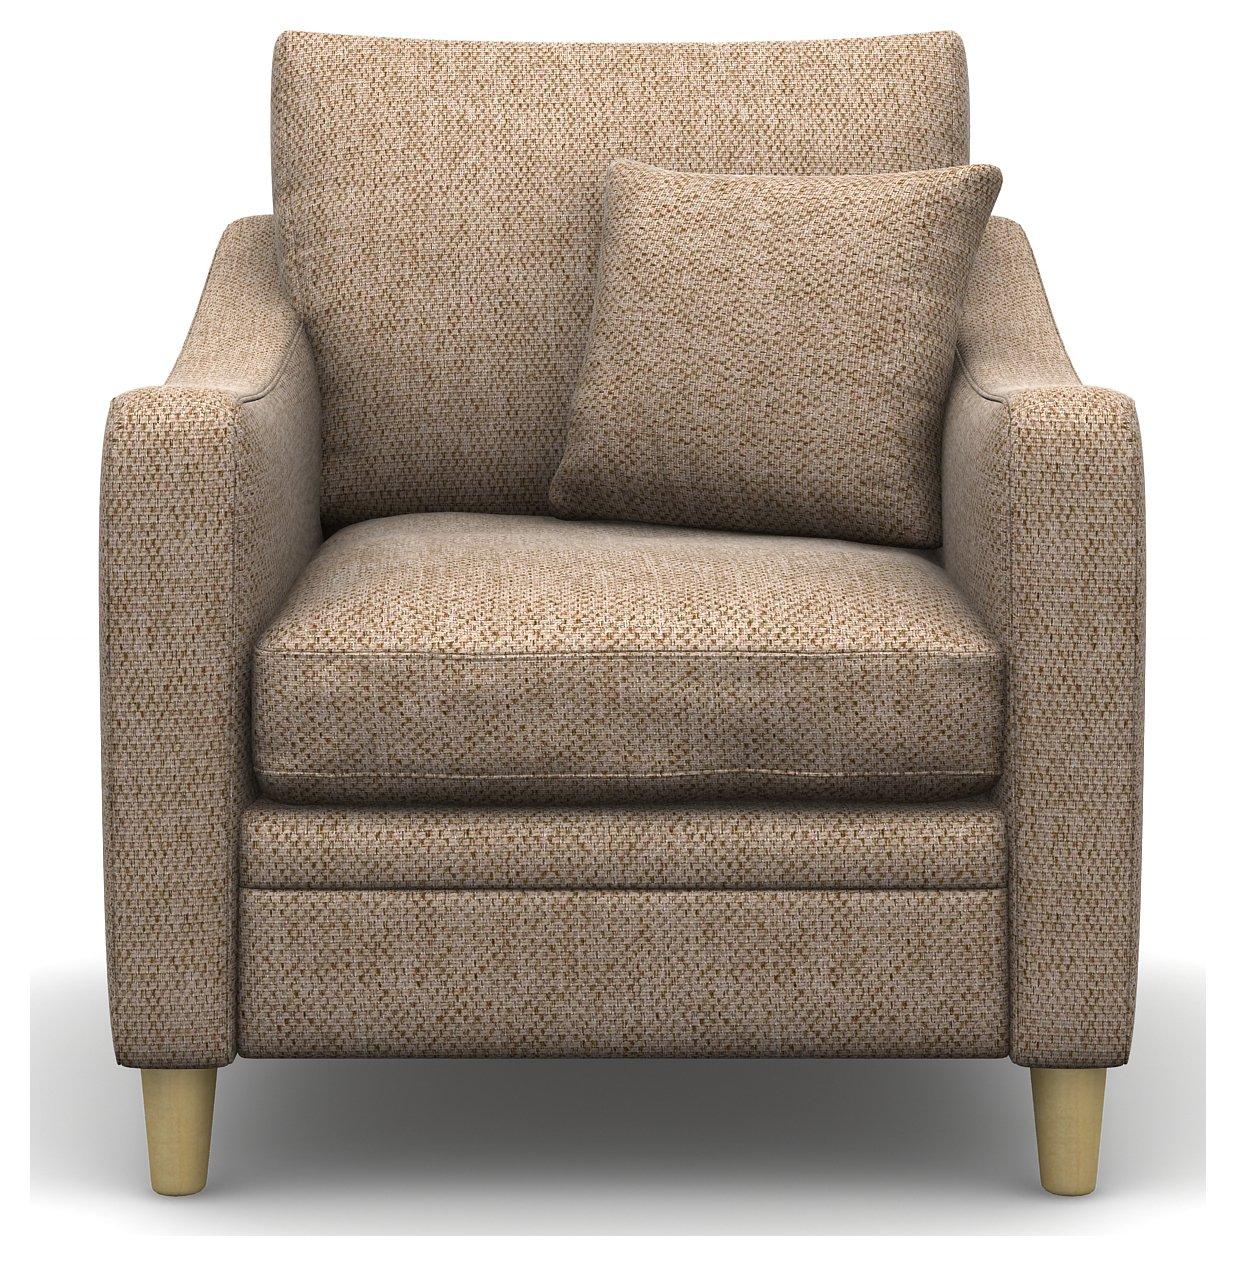 Heart of House Newbury Fabric Chair - Beige.